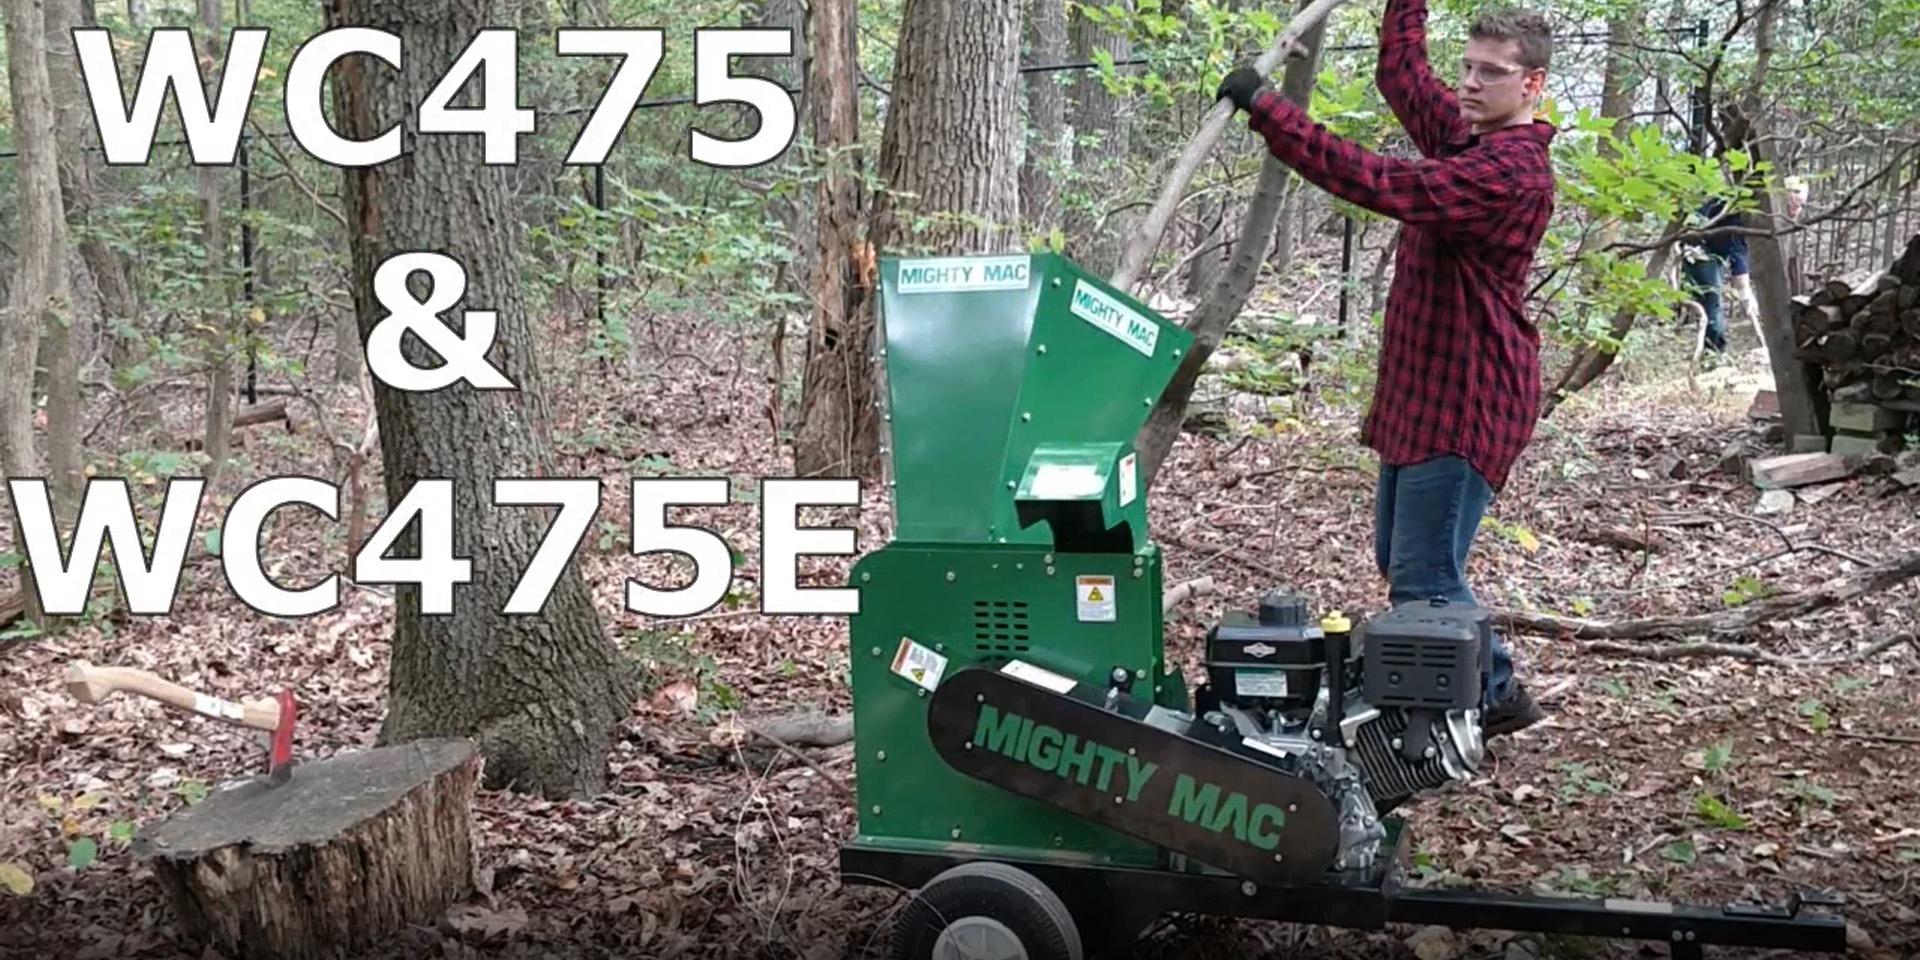 Mighty Mack Wood Chipper WC75 & WC475e